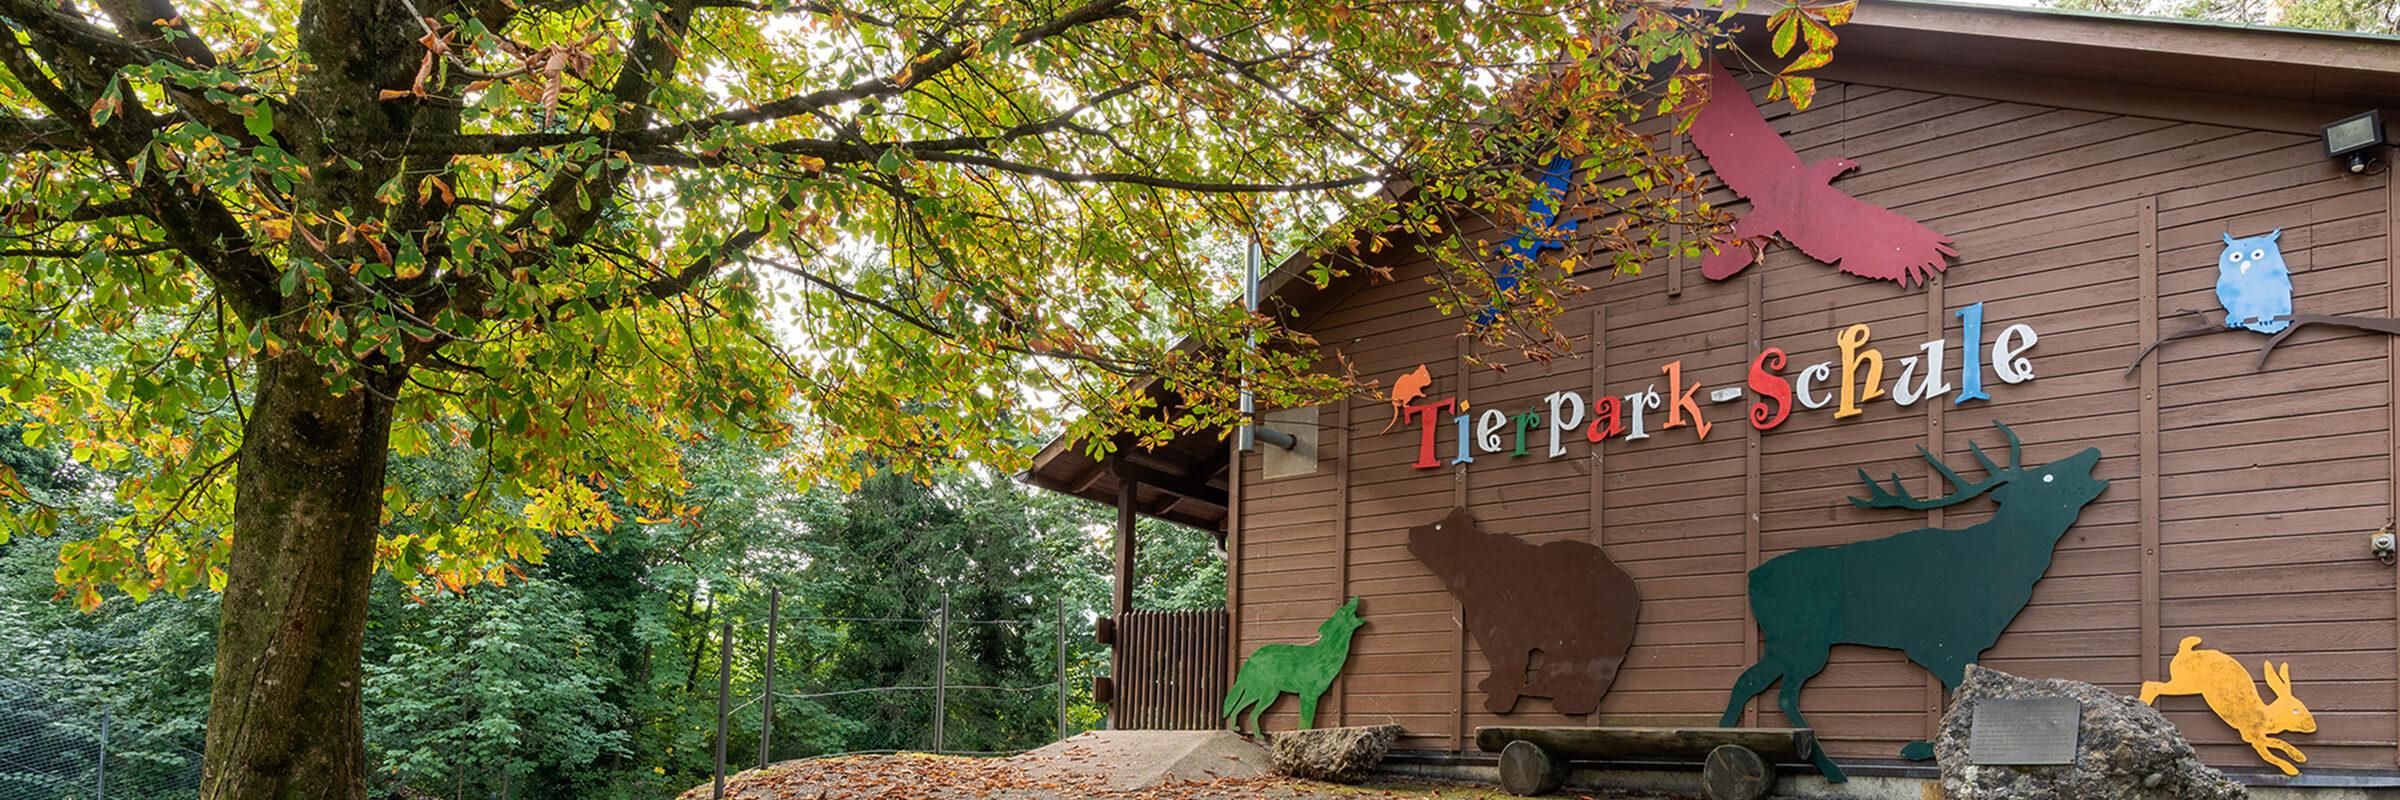 Tierparkschule